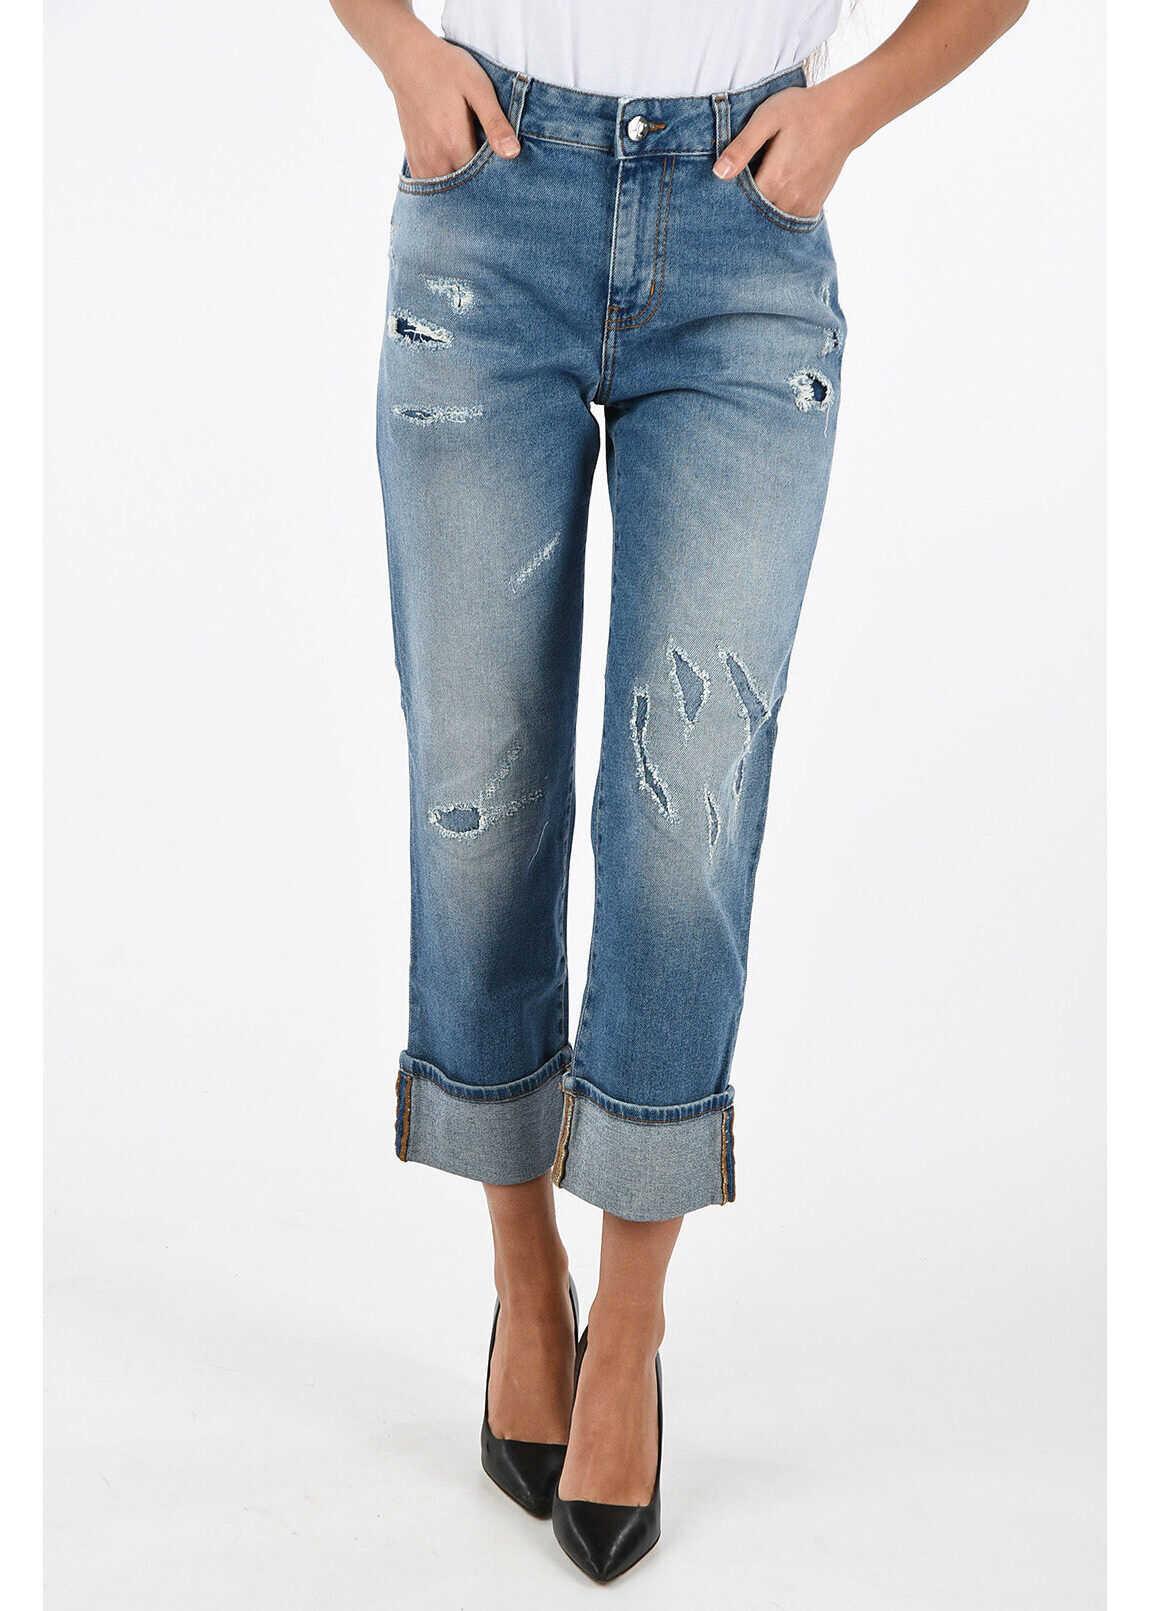 Just Cavalli Stretch Denim Boy Fit Jeans BLUE